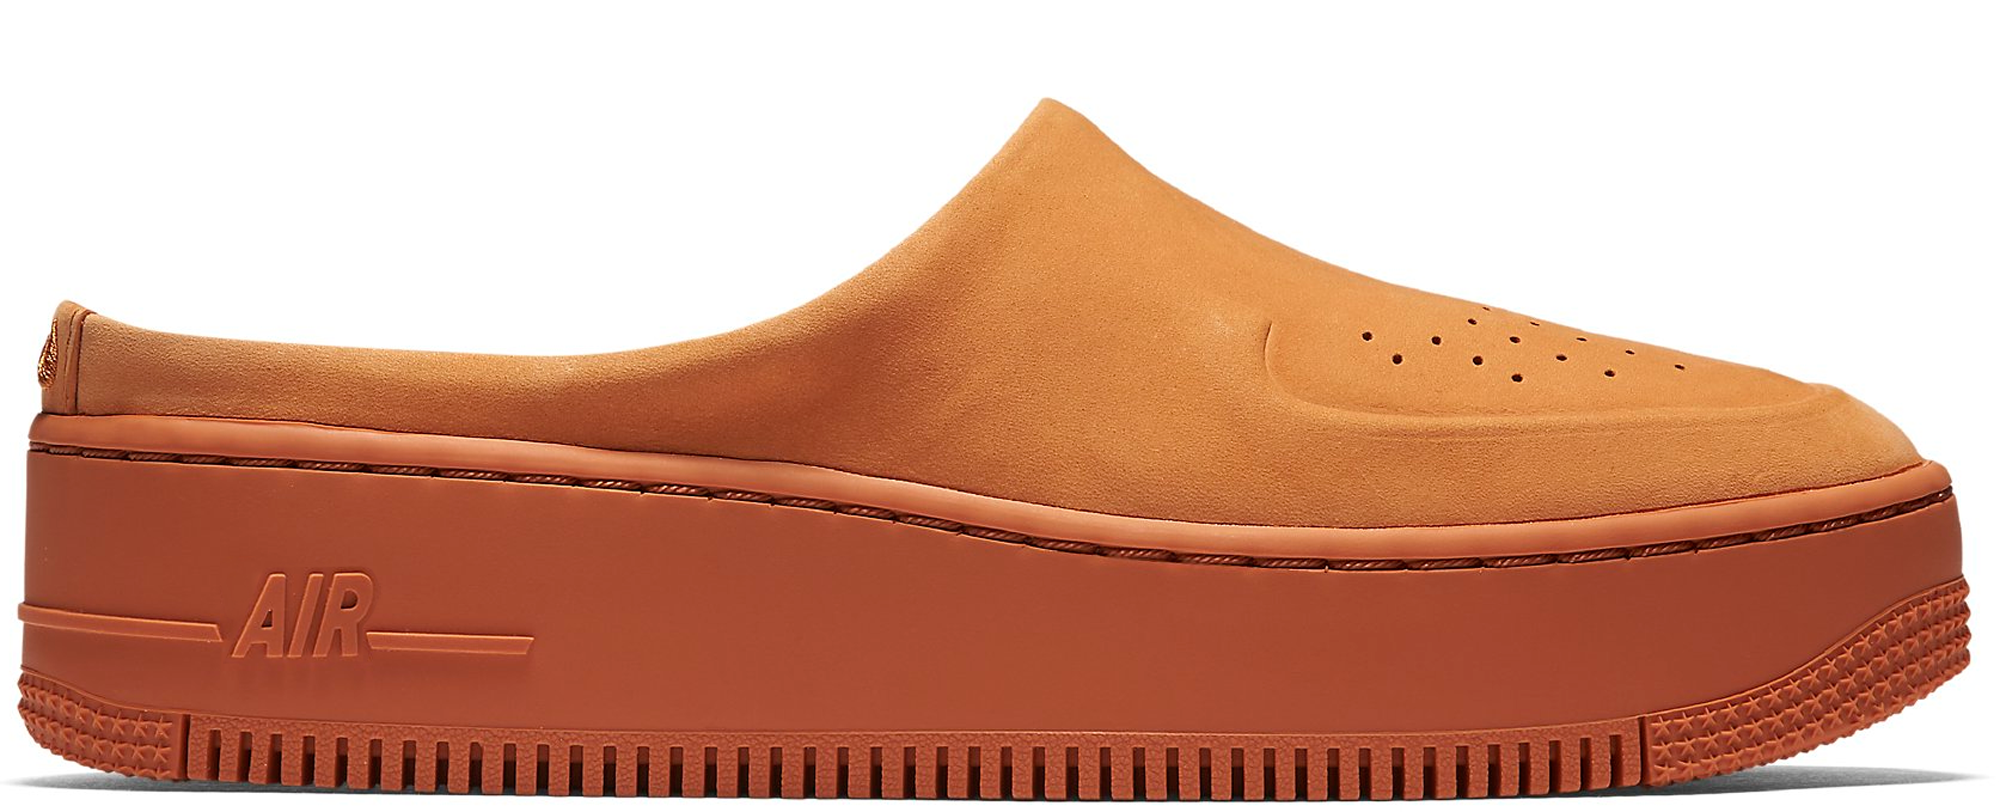 Nike Air Force 1 Lover XX Cinder Orange